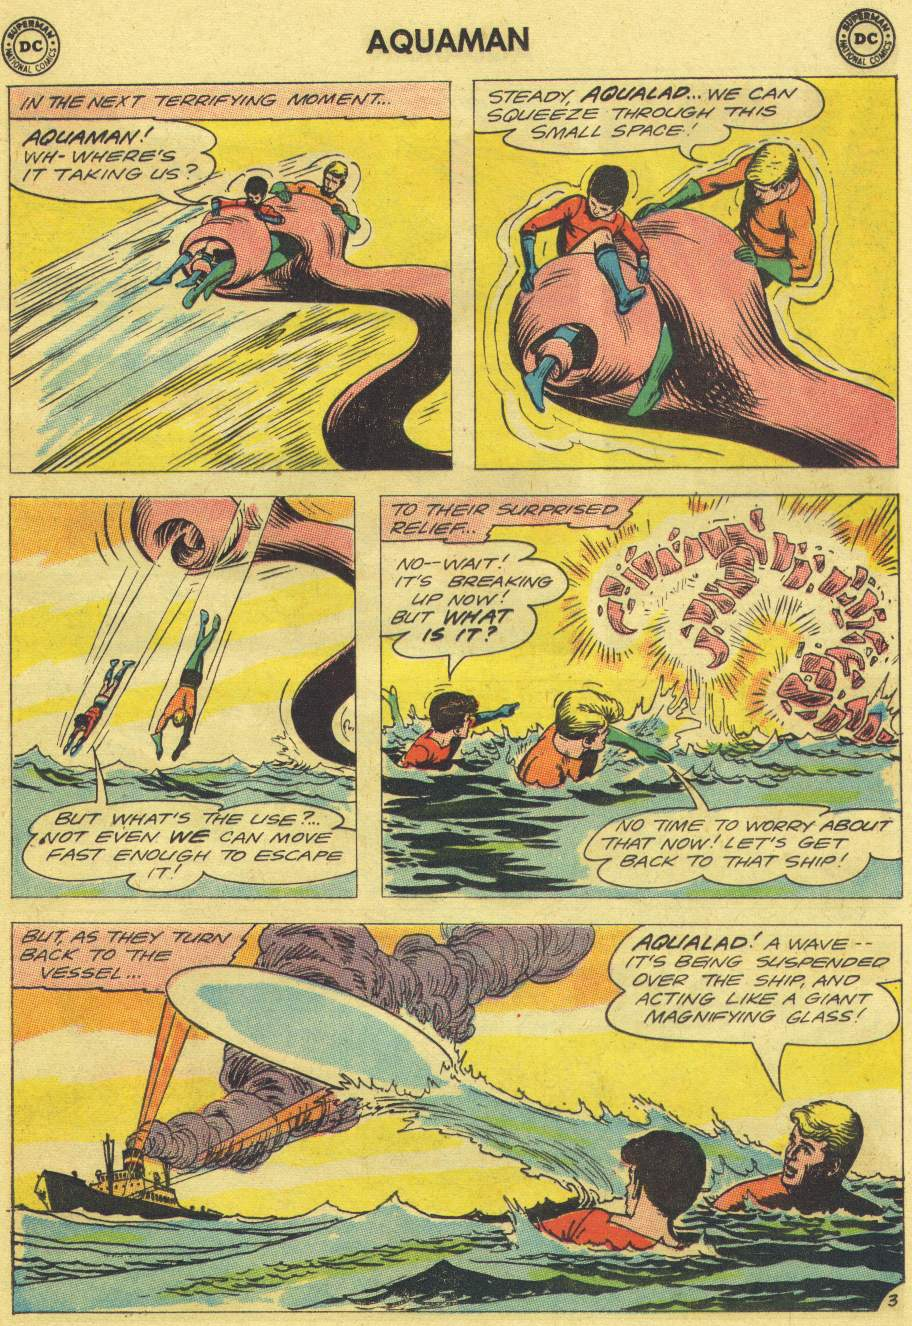 Read online Aquaman (1962) comic -  Issue #11 - 5